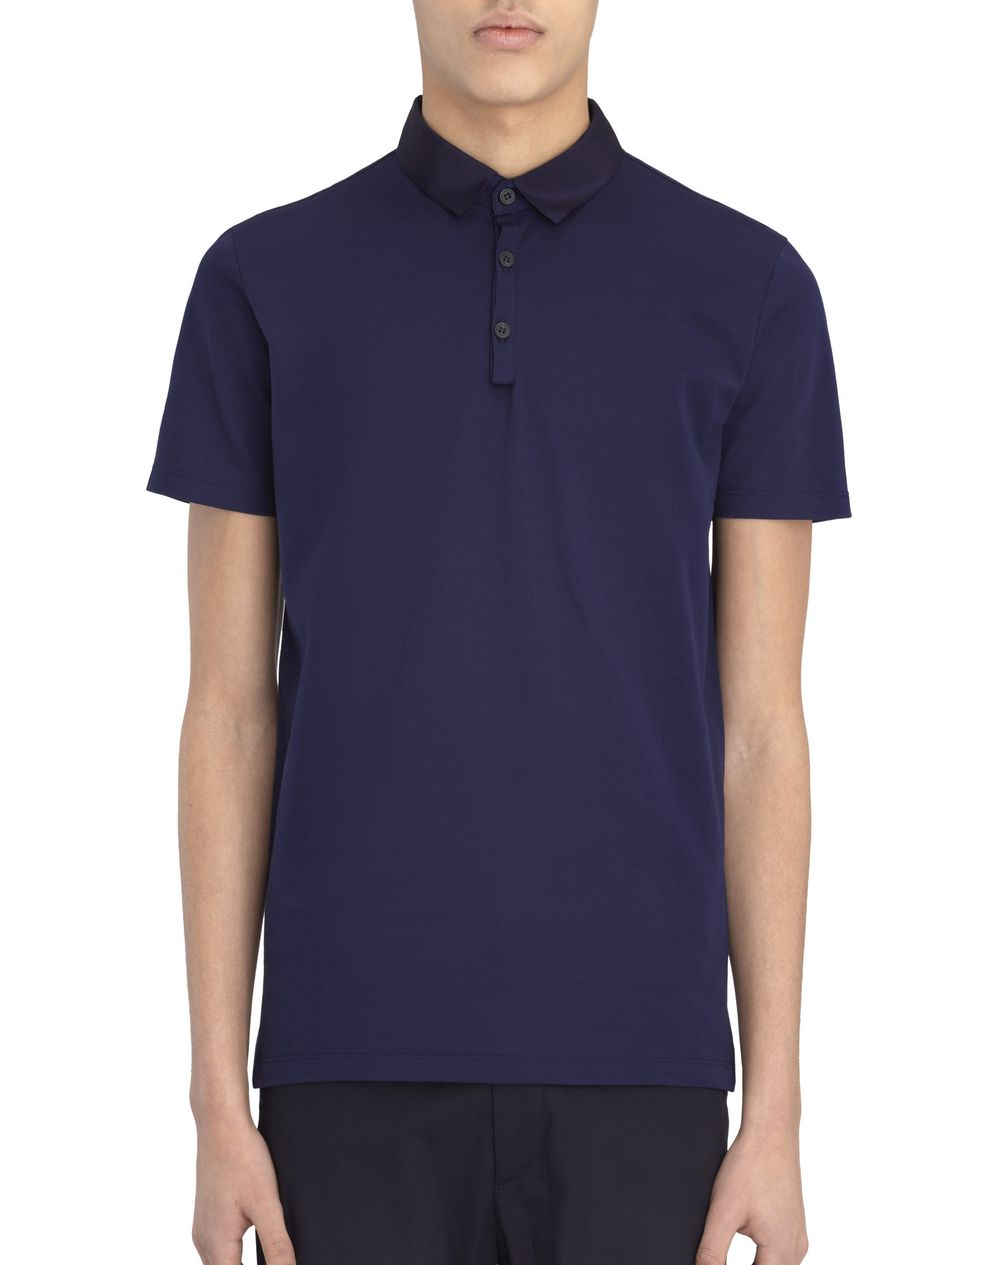 Lanvin Slim Fit Piqu Polo Shirt Polos T Shirts Men